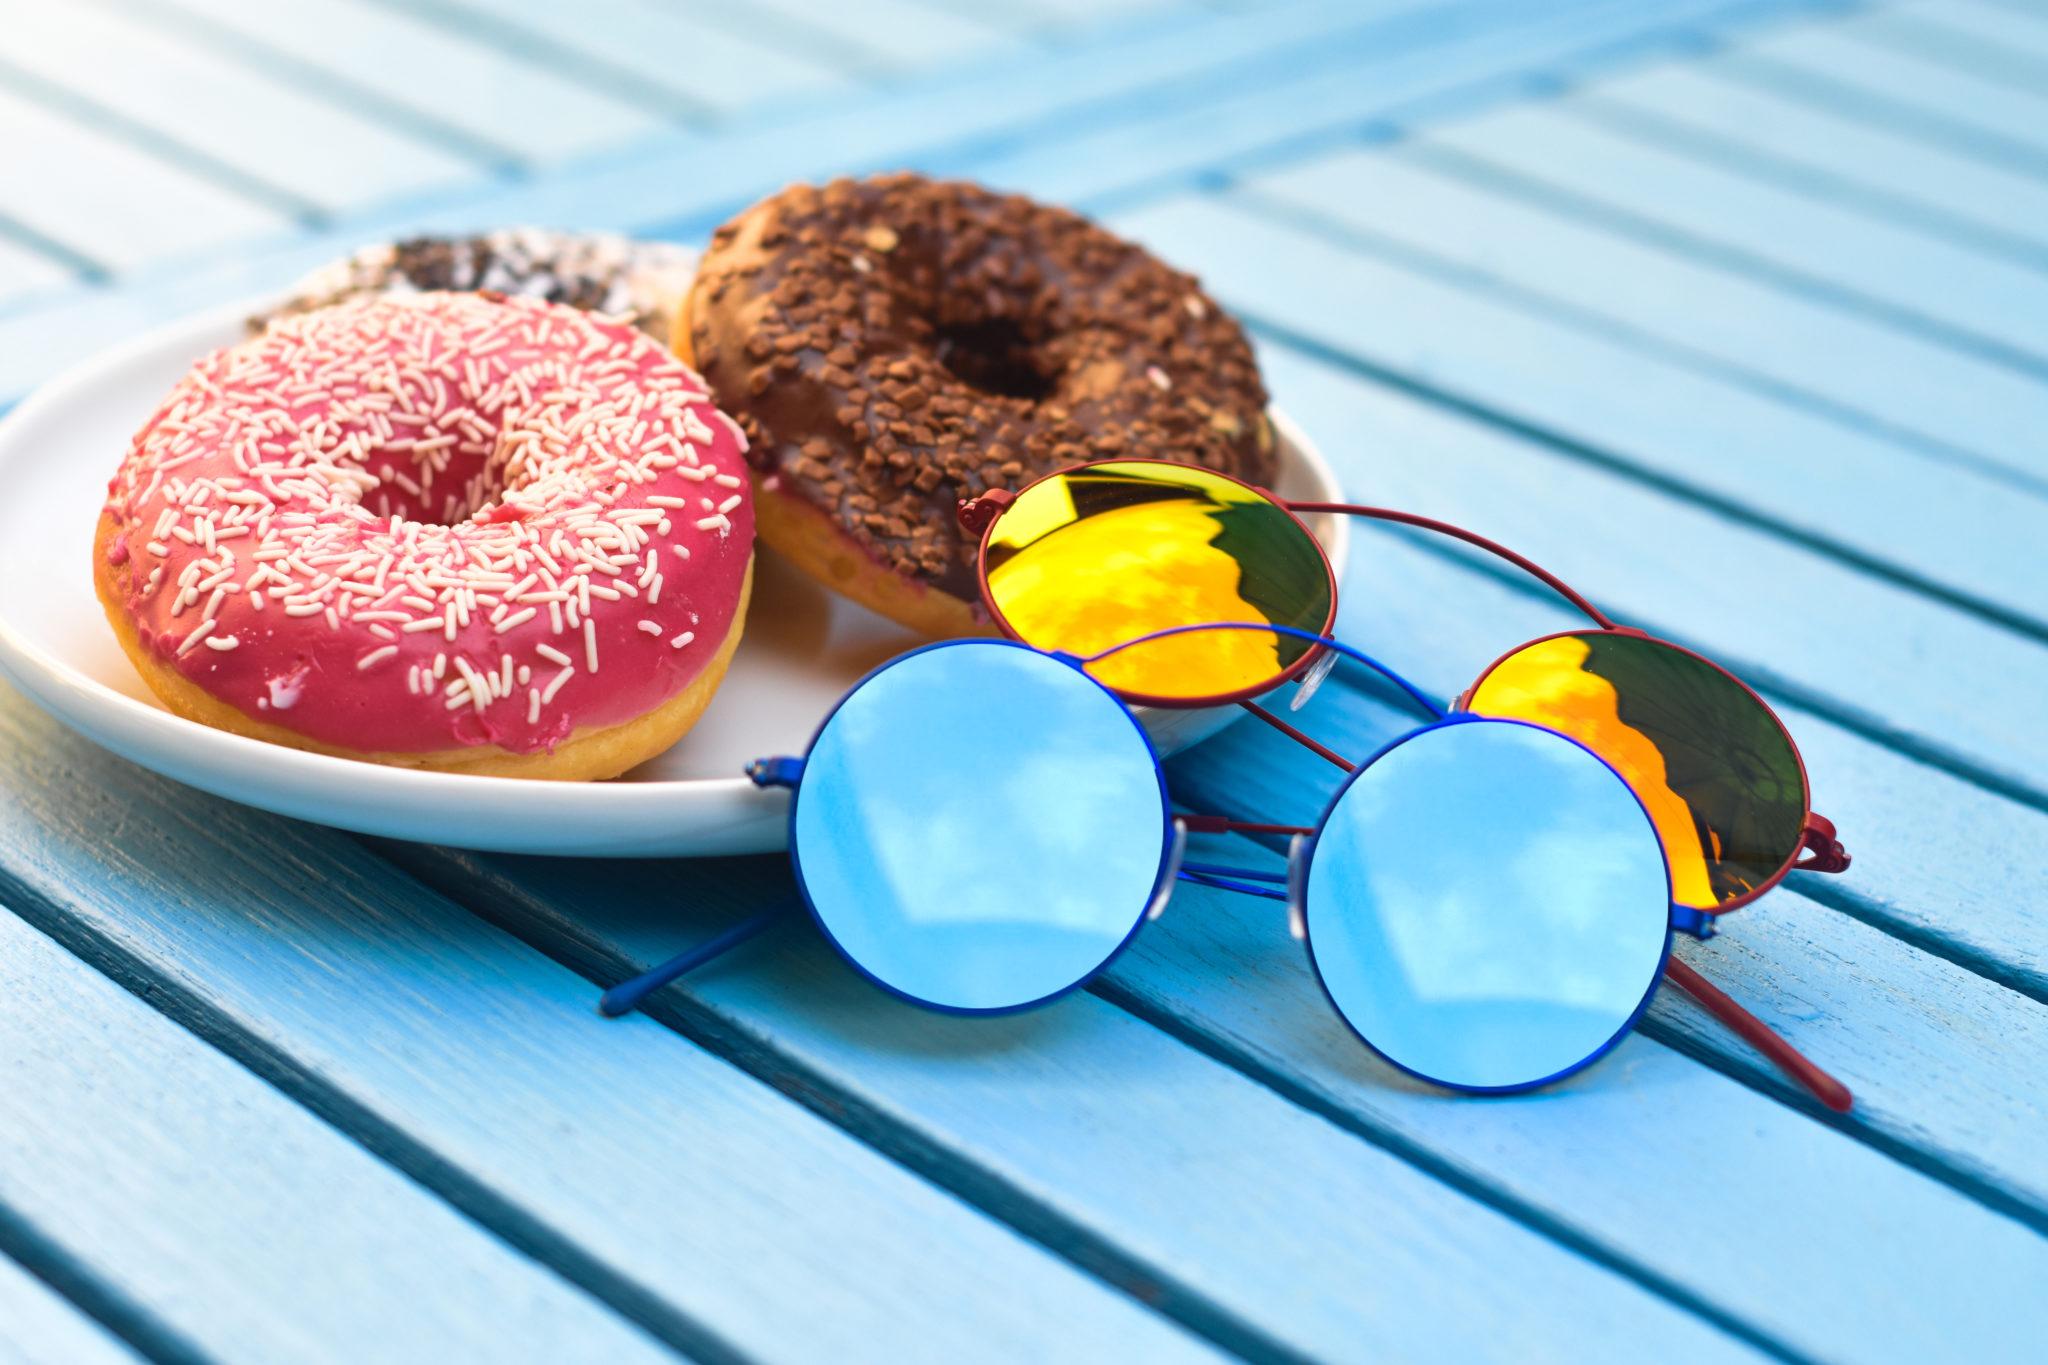 giulia de martin spektre sunglasses eyewear behindmyglasses.com mirror lenses metro 2 flat met-ro sunnies -3